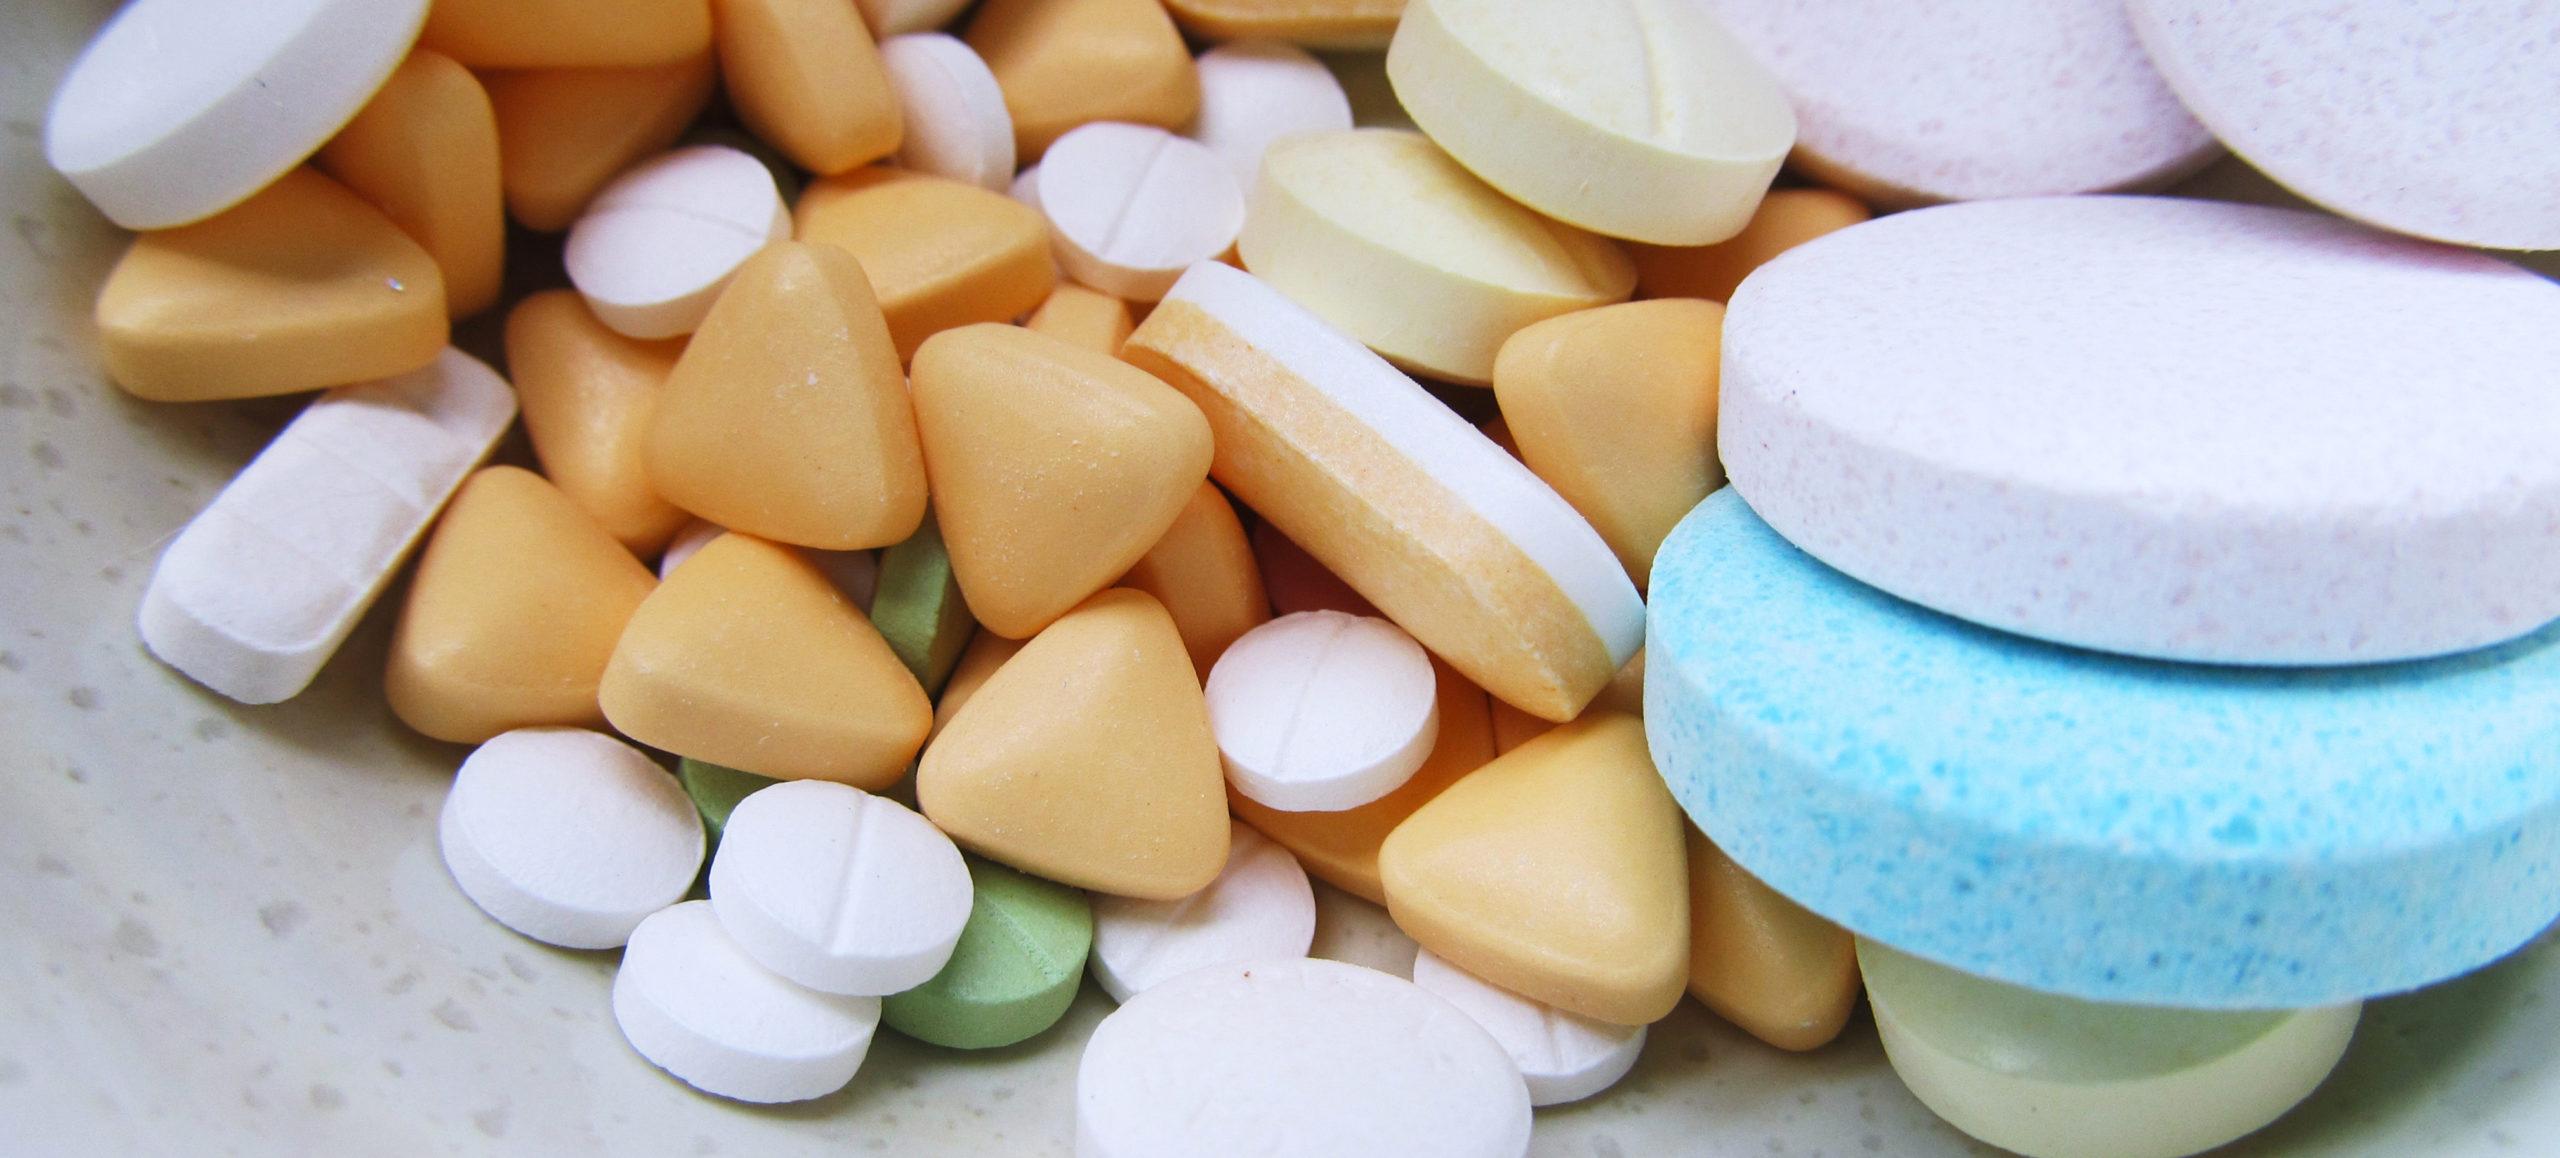 Déshumidification pharmacie